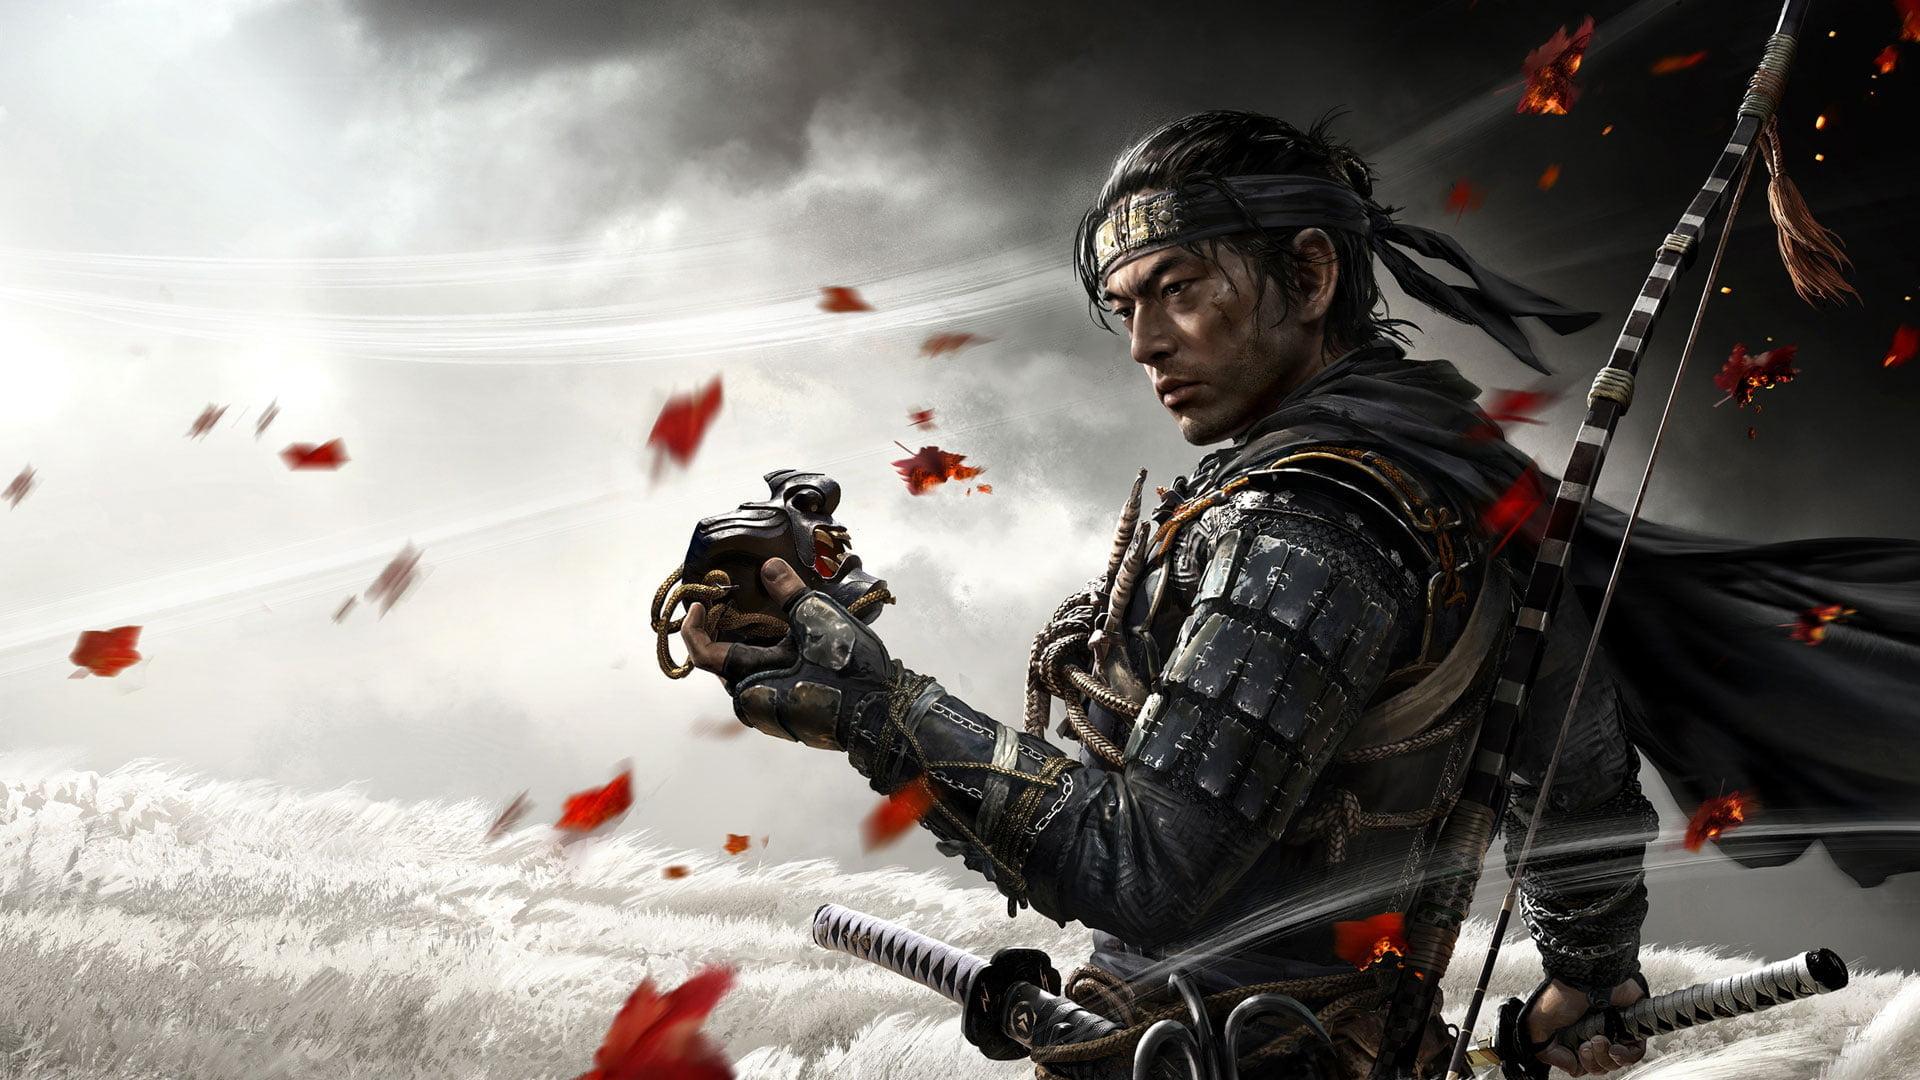 Giappone Feudale: 4 Videogiochi Più Caratteristici 13 - Hynerd.it